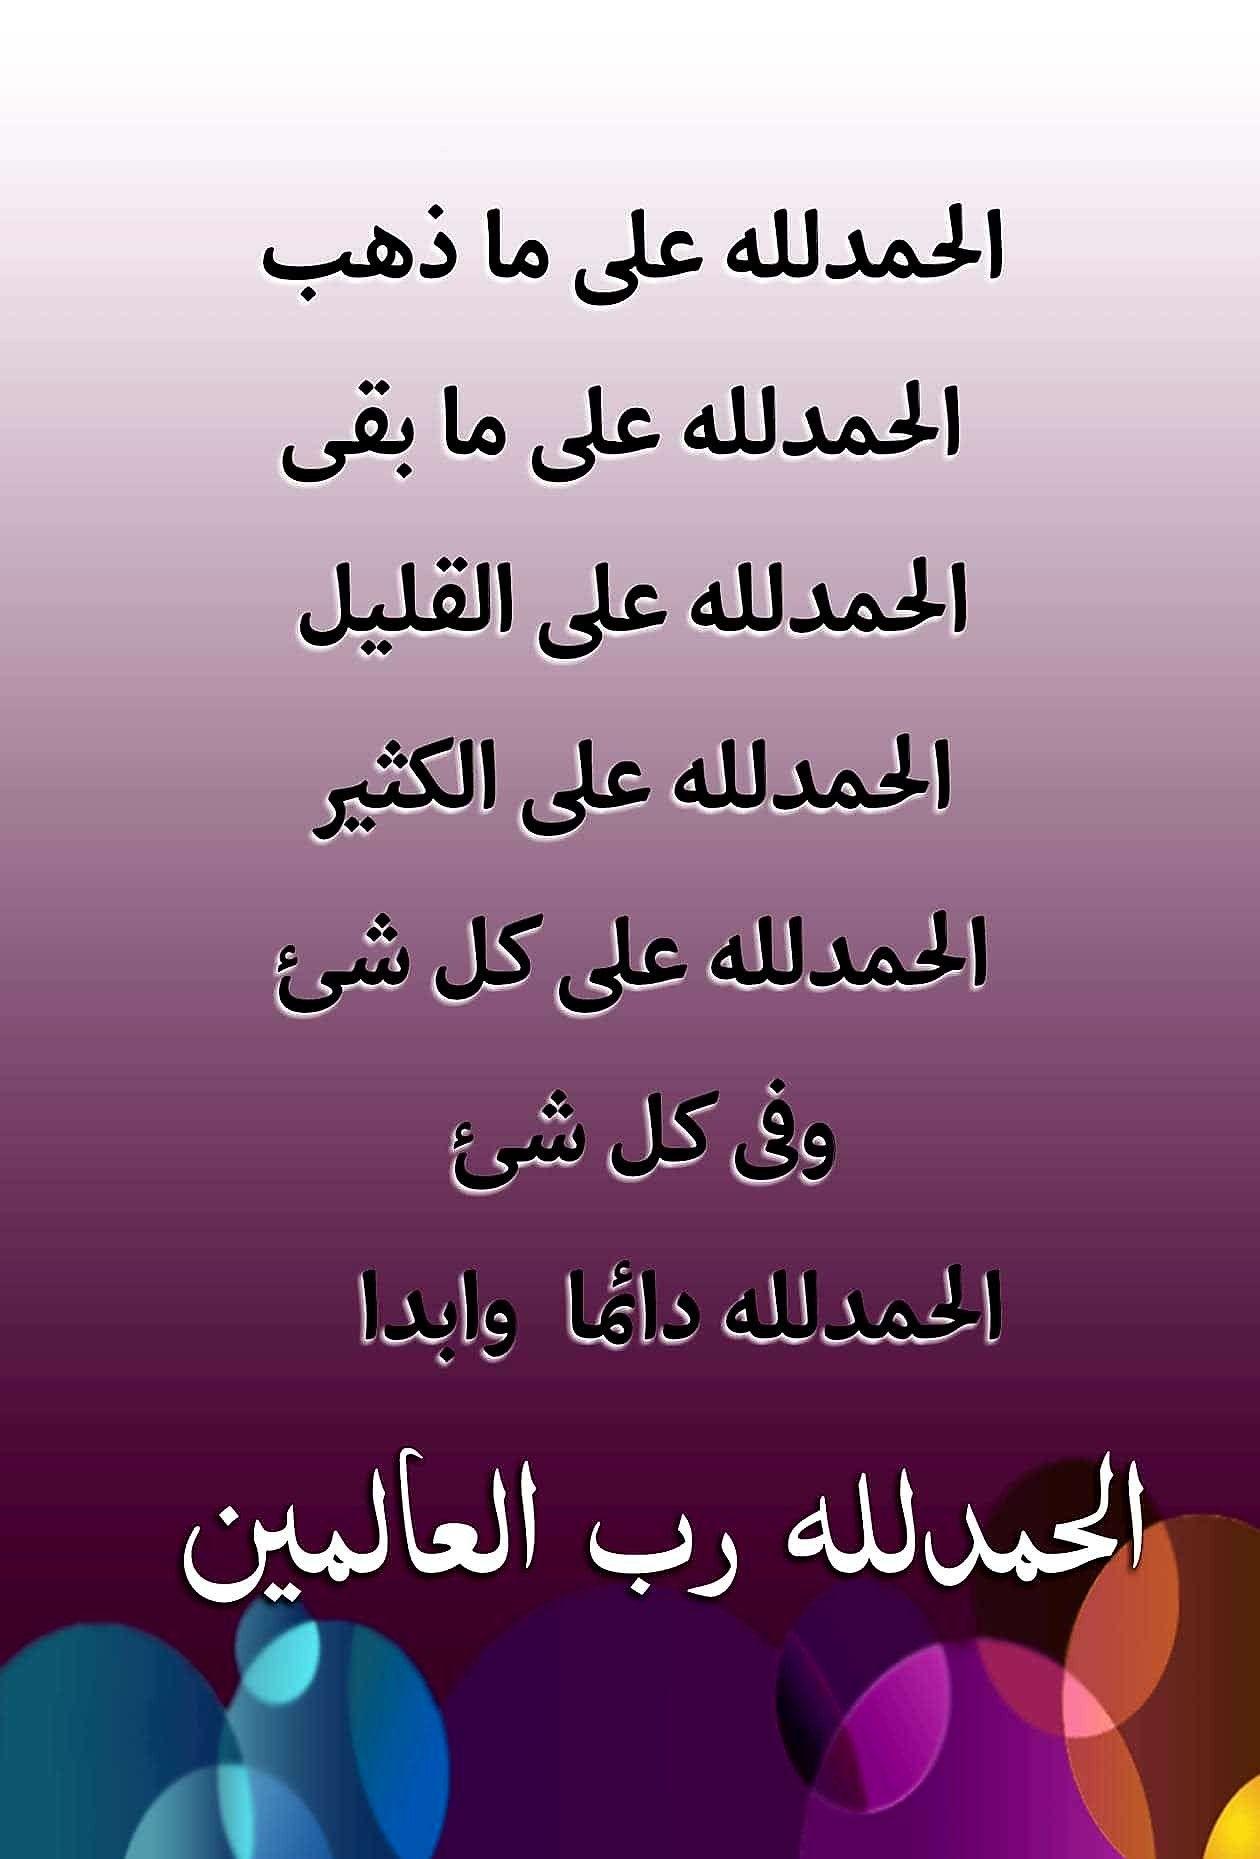 Pin By The Noble Quran On I Love Allah Quran Islam The Prophet Miracles Hadith Heaven Prophets Faith Prayer Dua حكم وعبر احاديث الله اسلام قرآن دعاء Hadeeth Allah